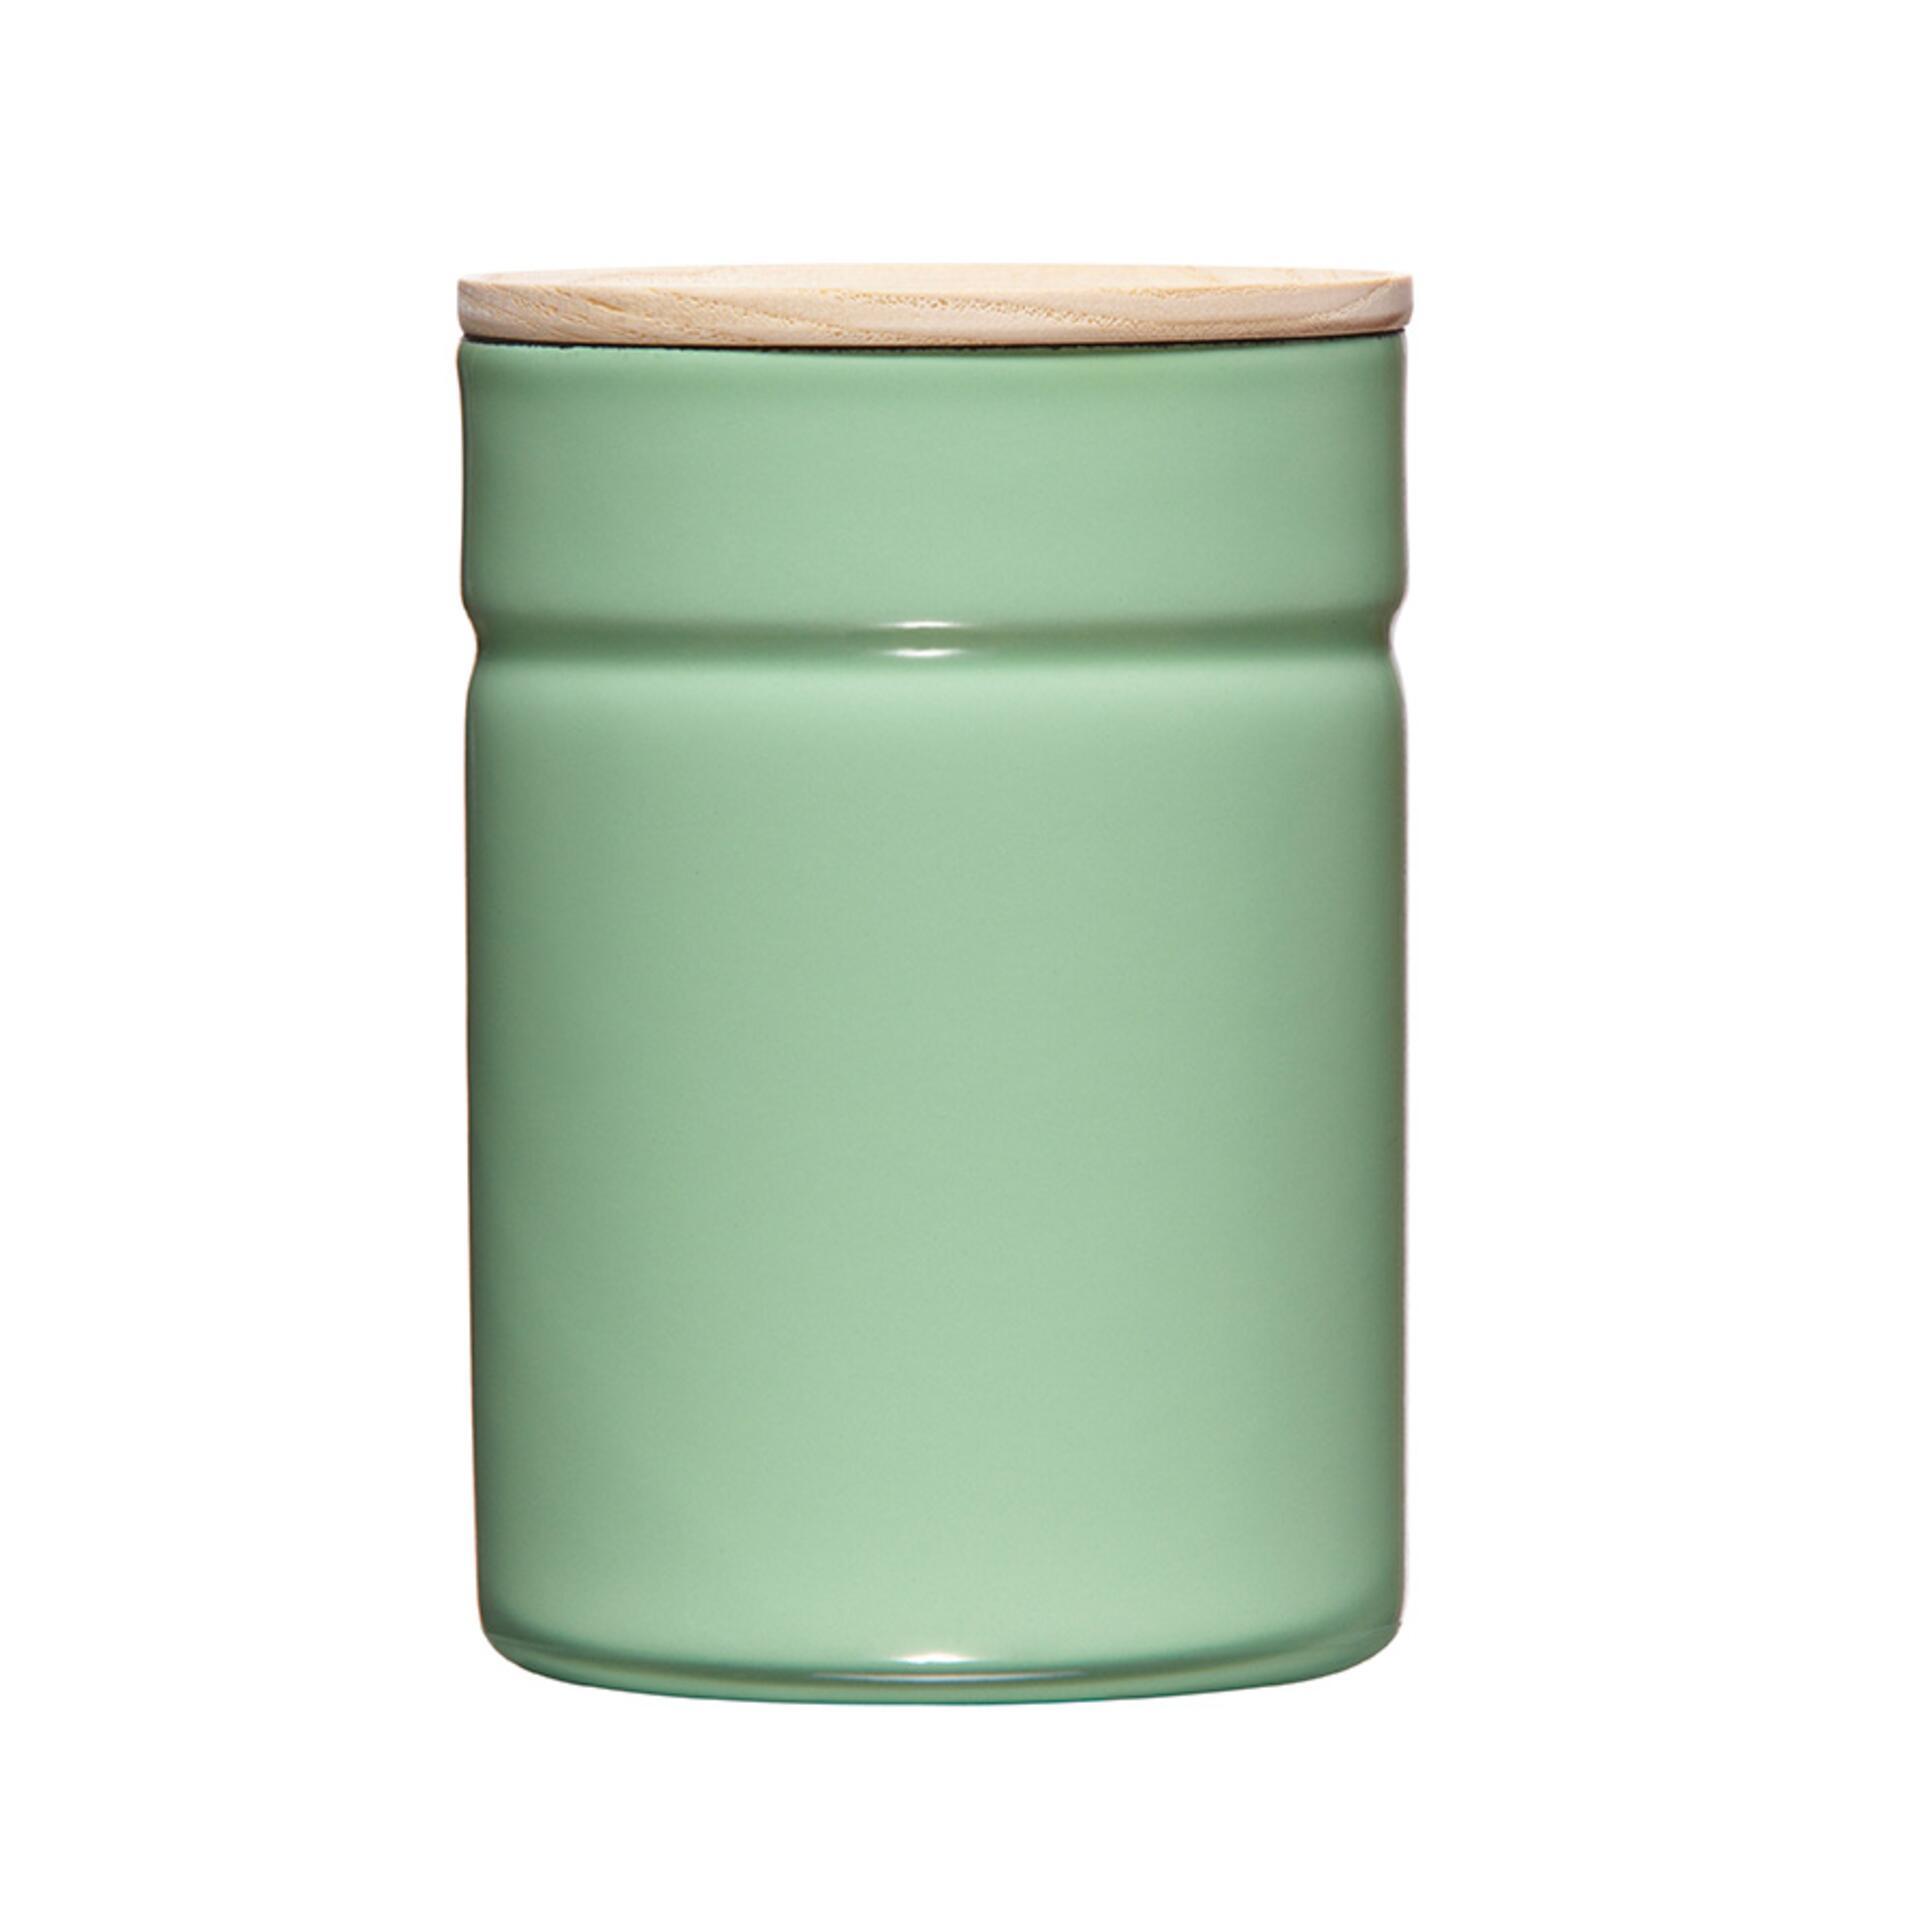 Riess Vorratsdose 525 ml Grün